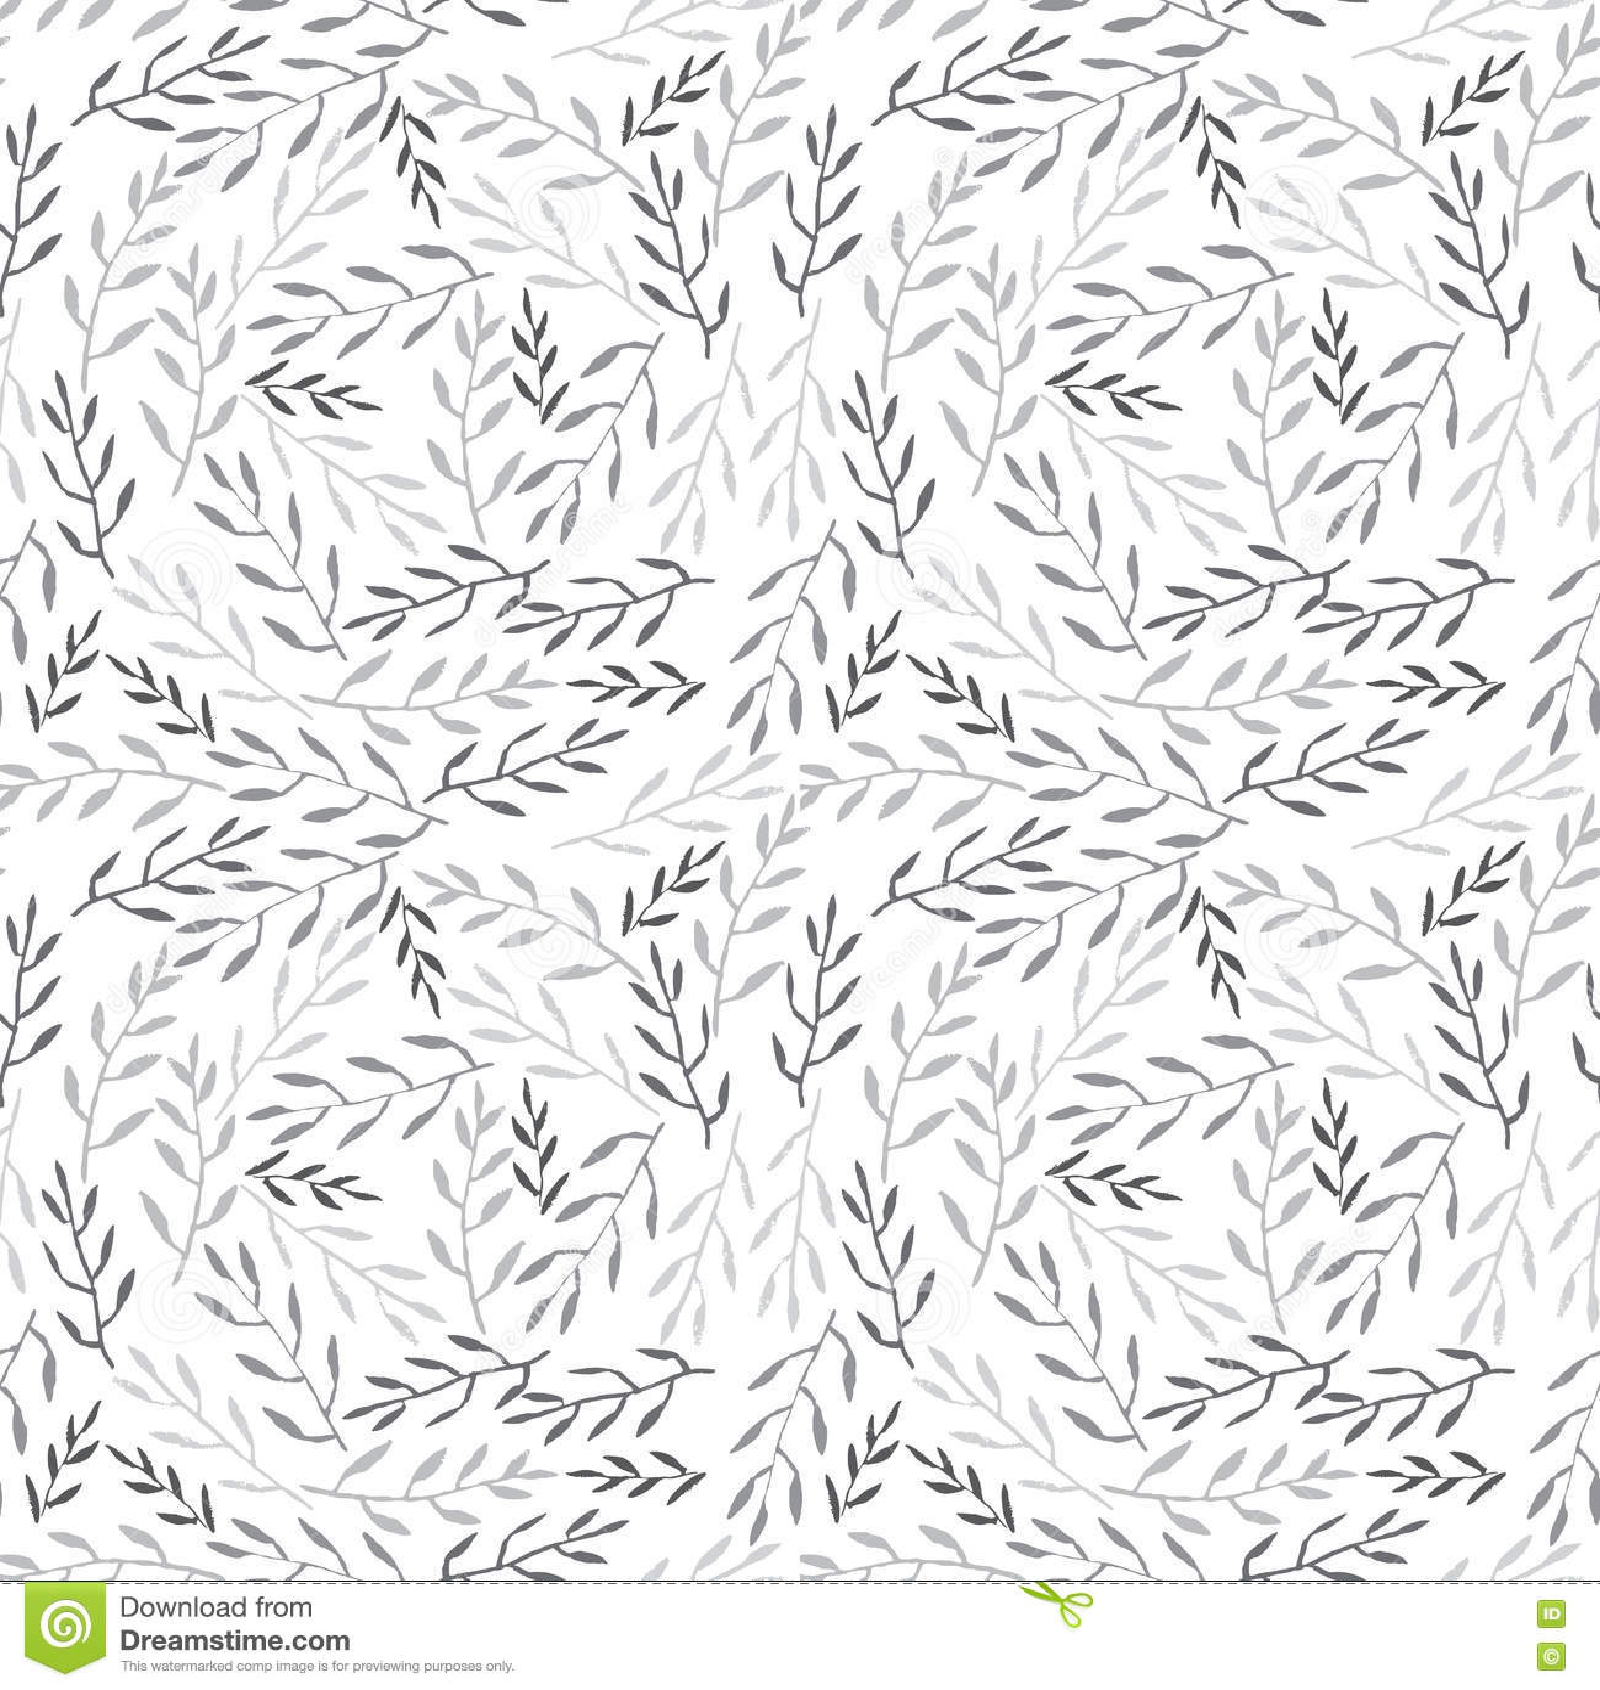 Cute hand drawn Leaves ornament. Monochromel Vector seamless pattern.